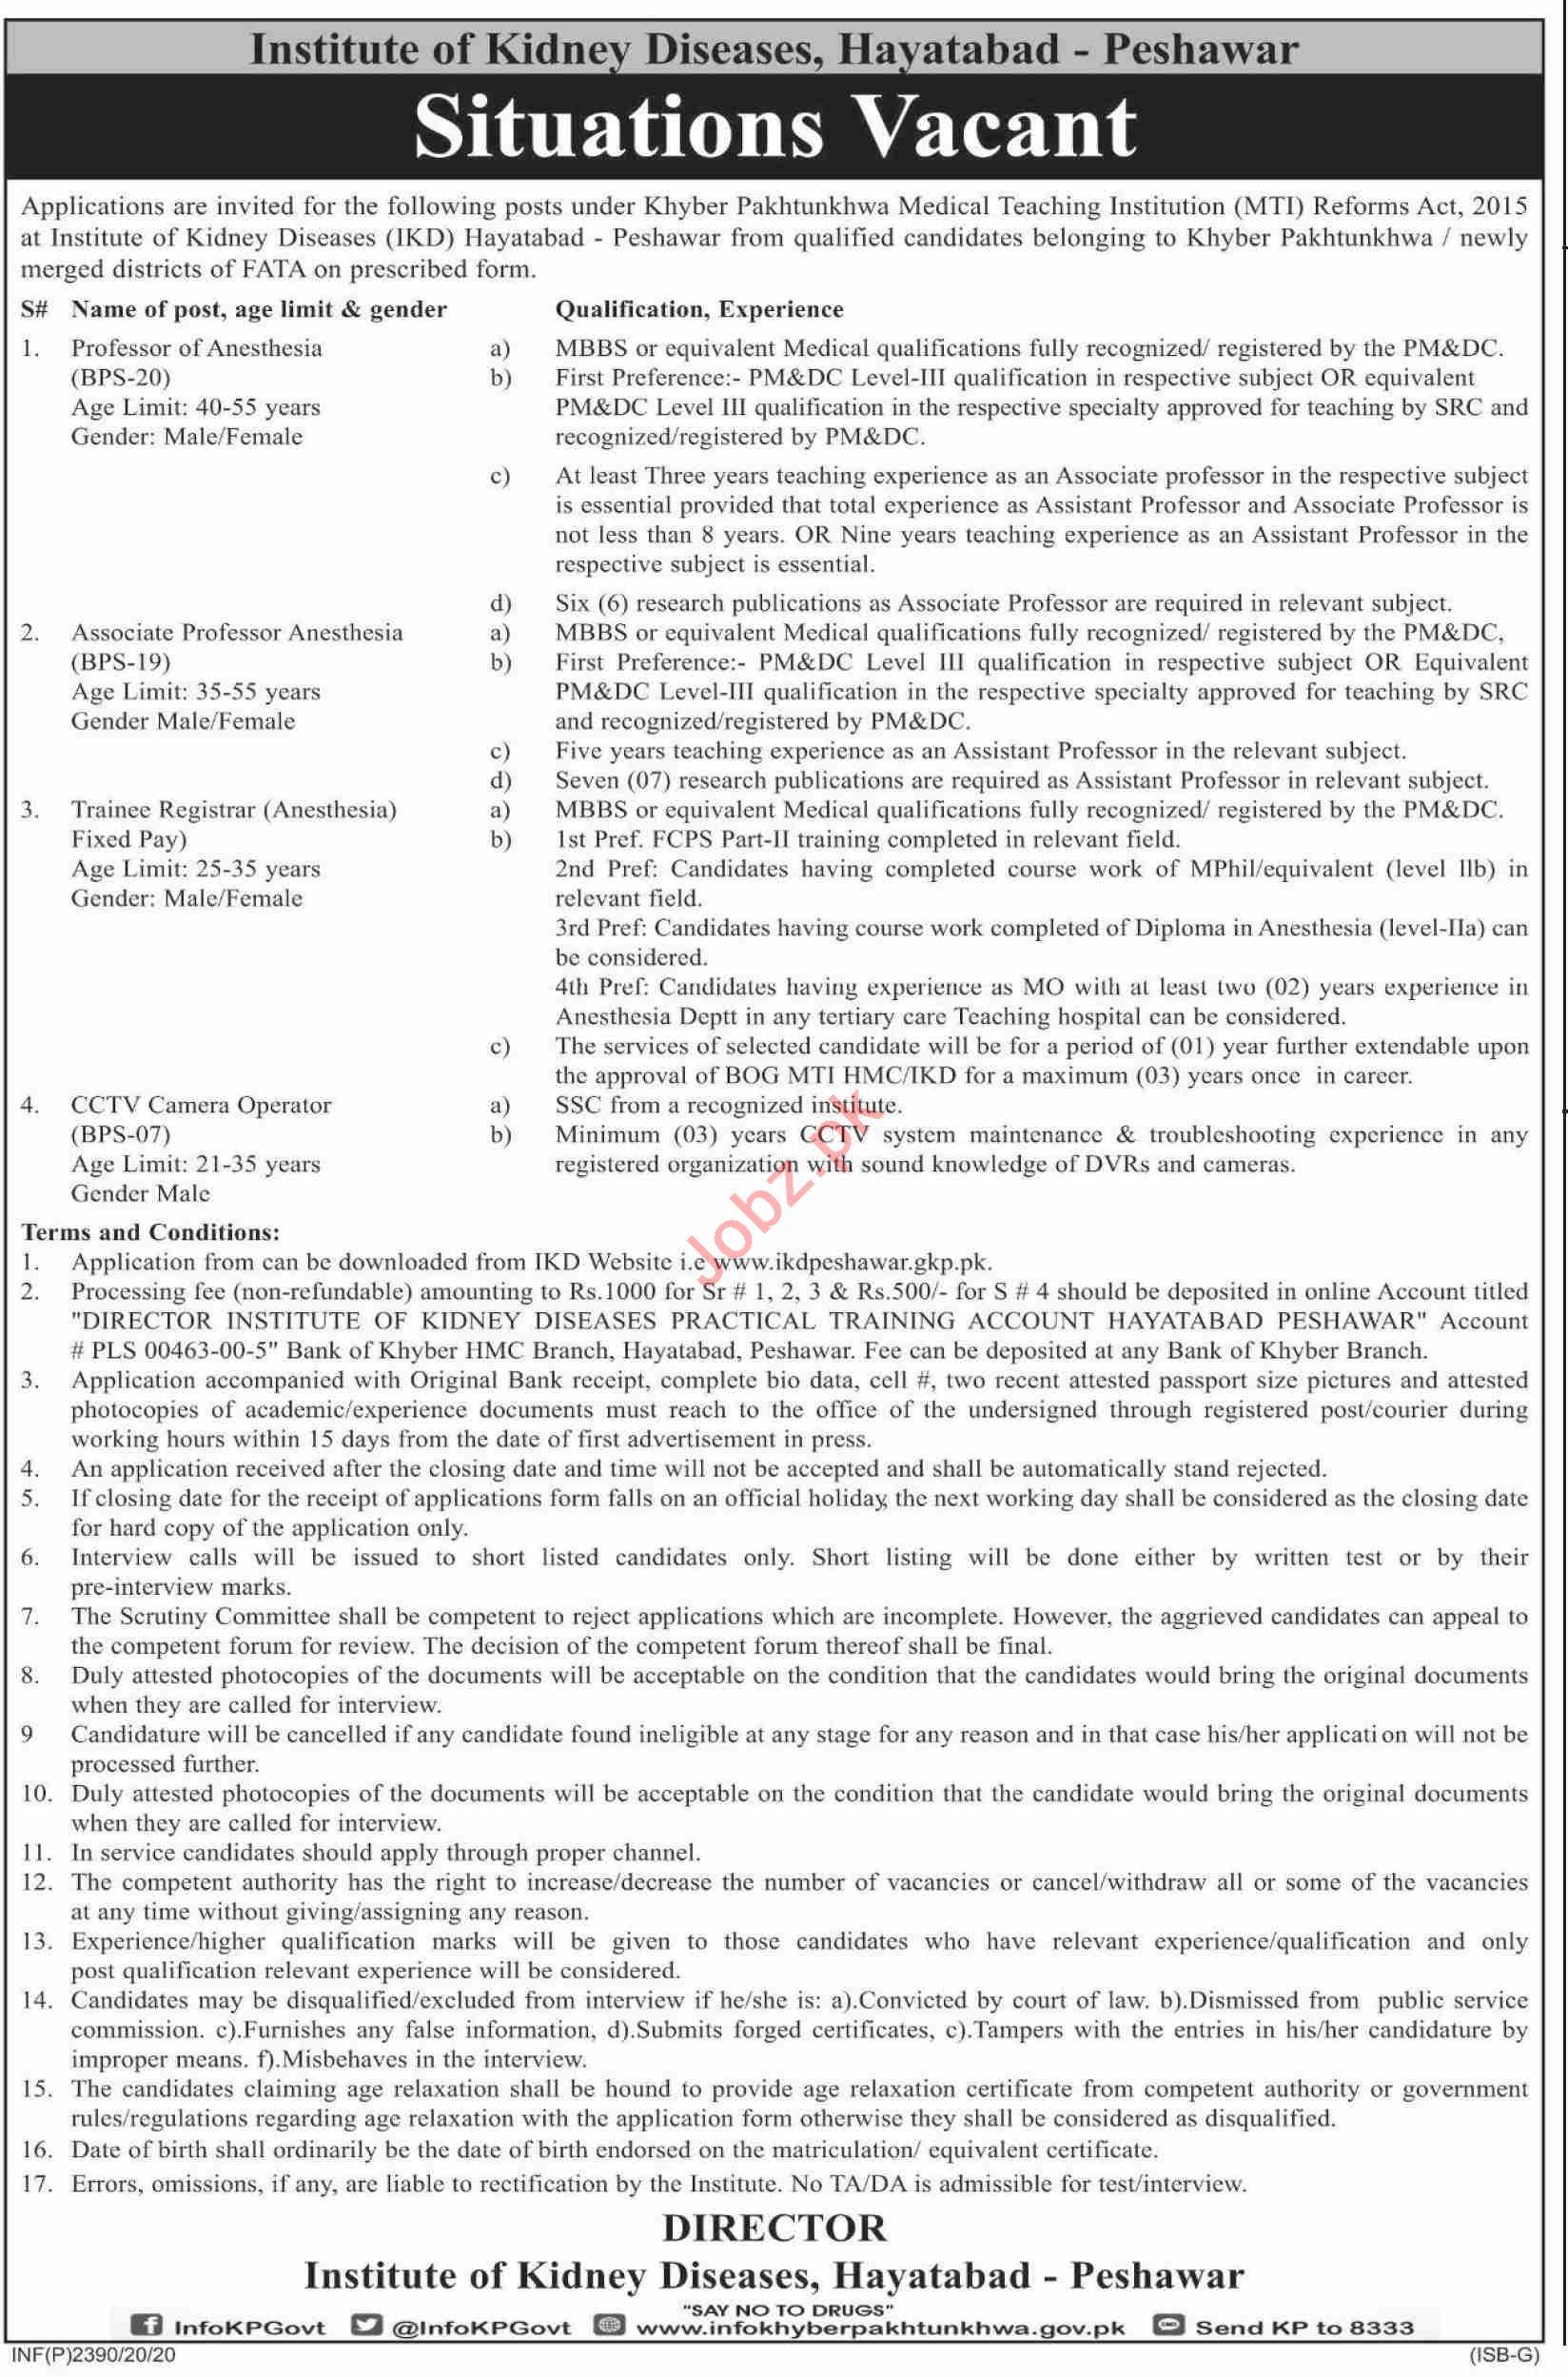 Institute of Kidney Diseases IKD HMC Peshawar Jobs 2020